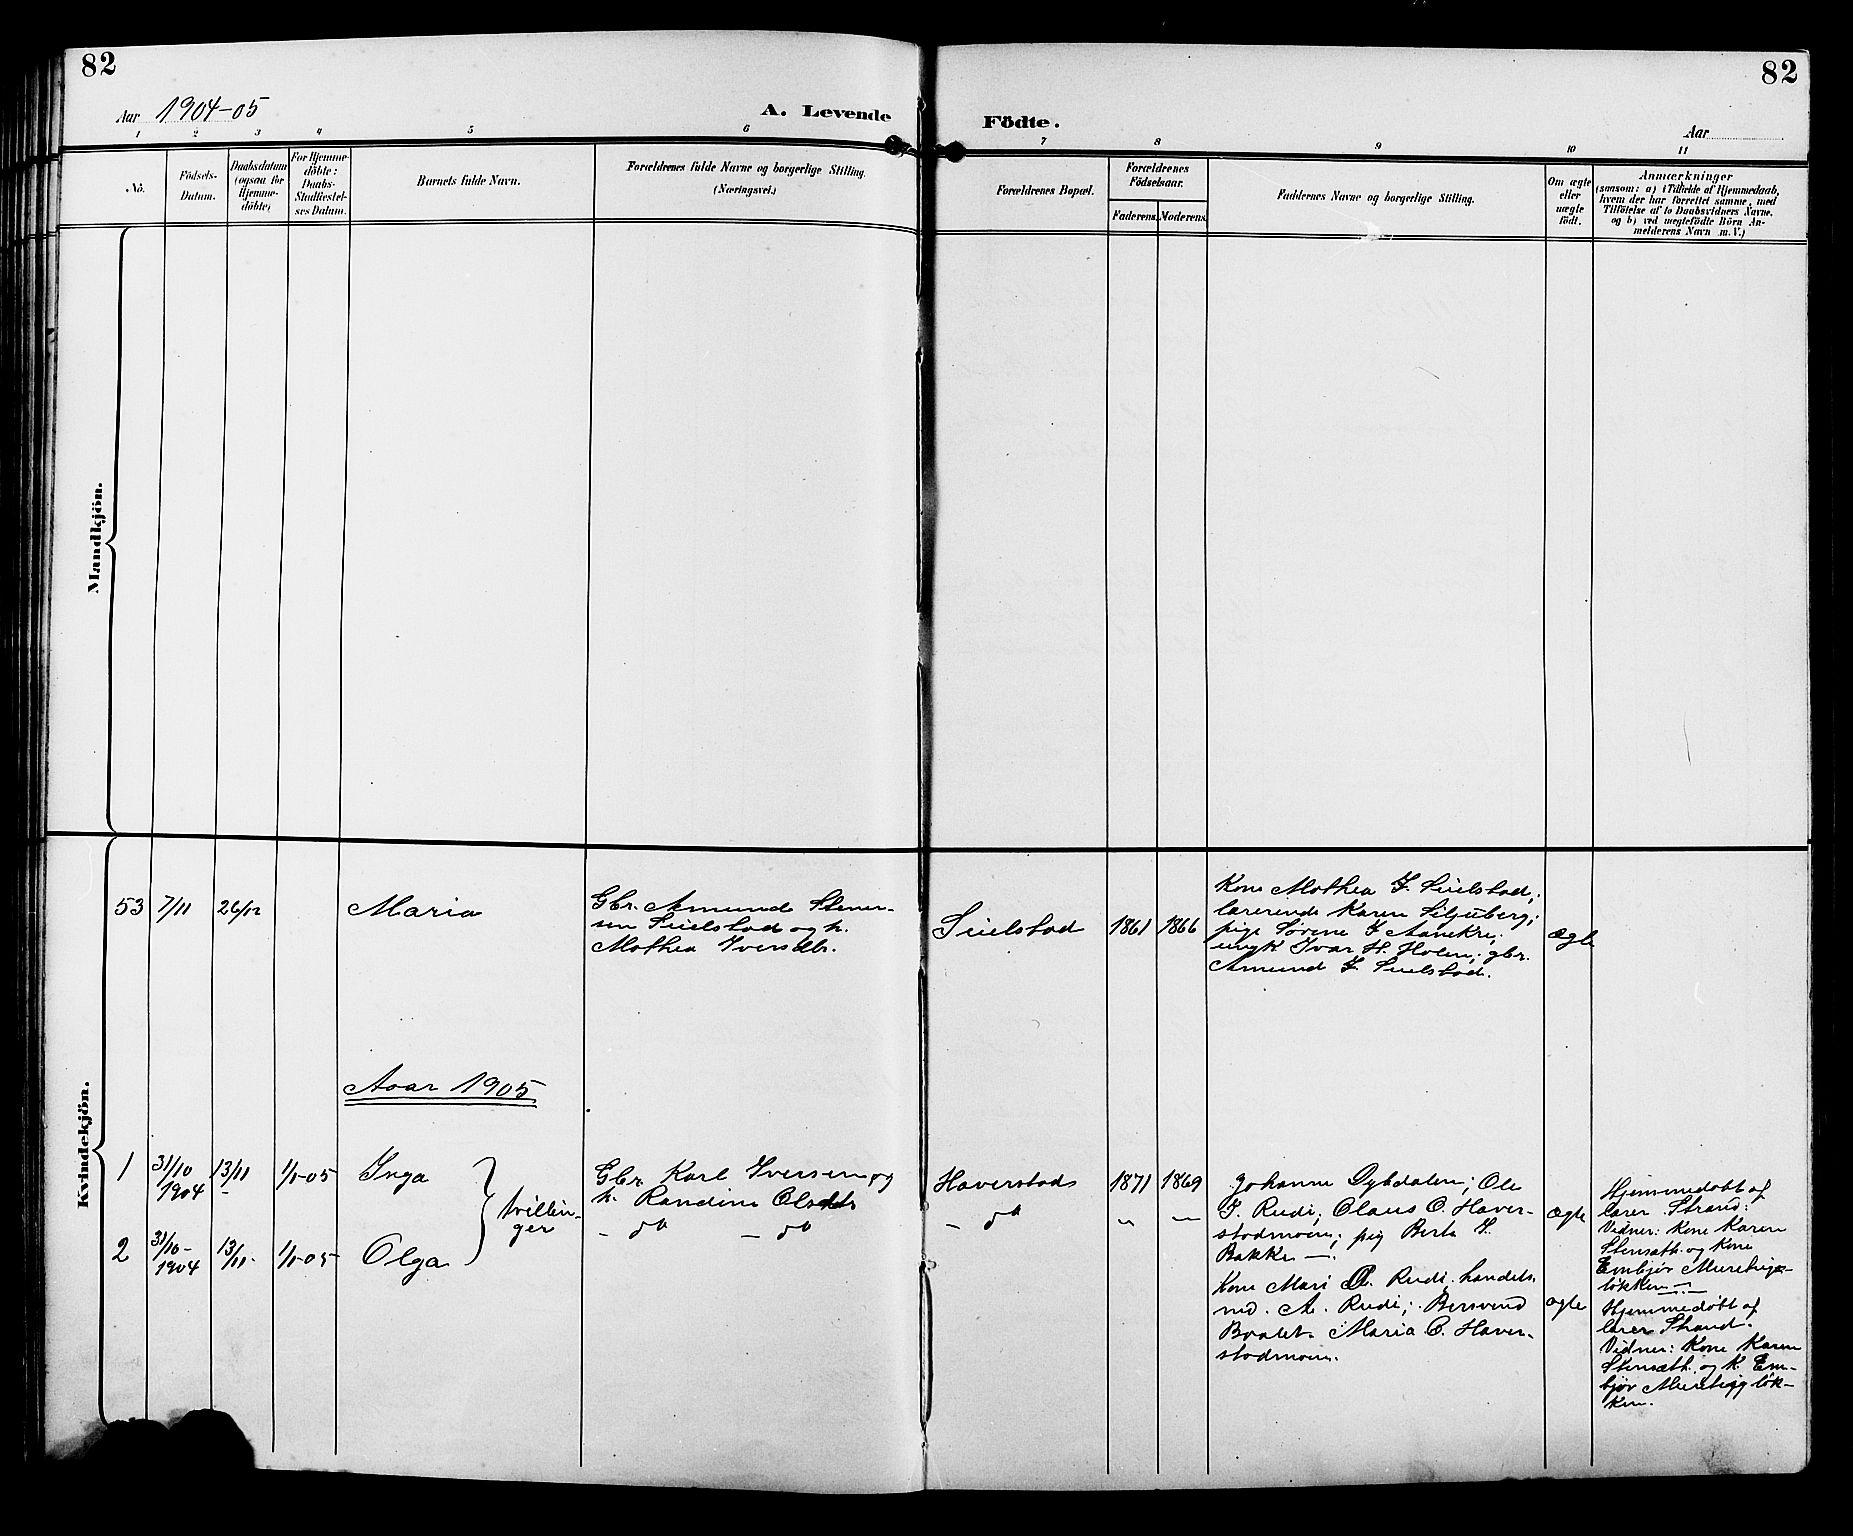 SAH, Sør-Fron prestekontor, H/Ha/Hab/L0004: Klokkerbok nr. 4, 1896-1911, s. 82